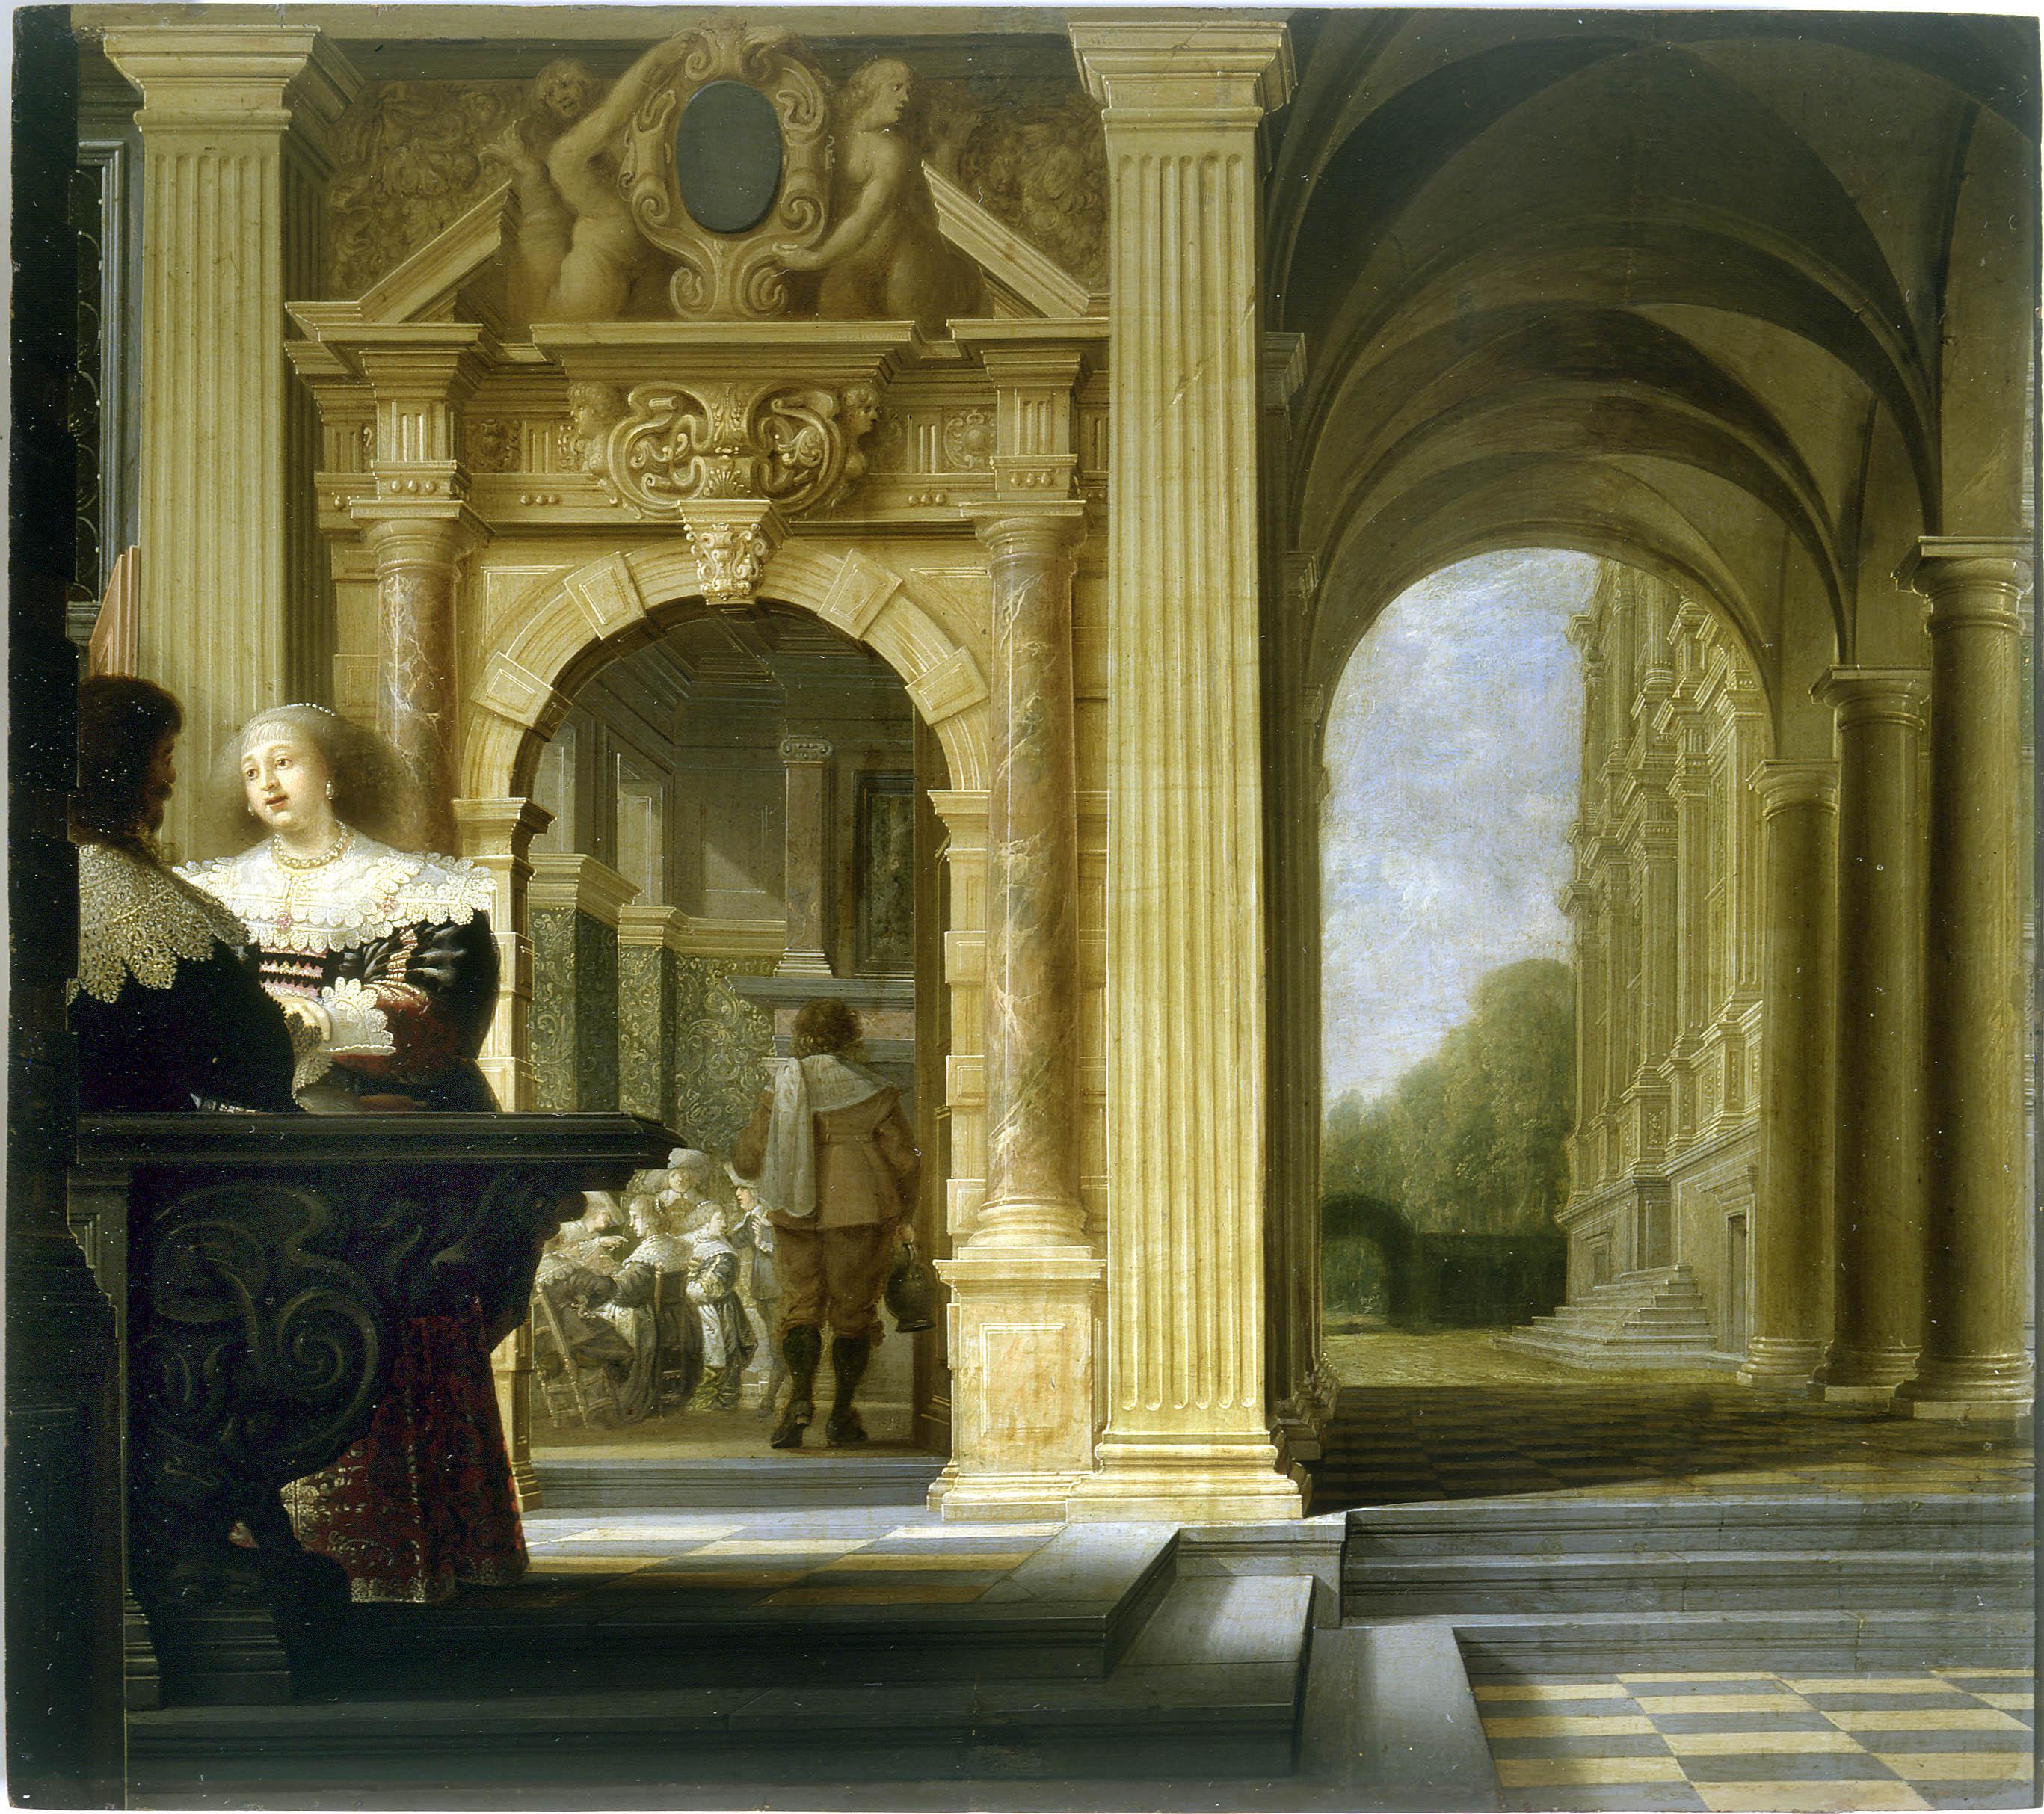 Dirck van Delen - A scene of gallantry in a palace